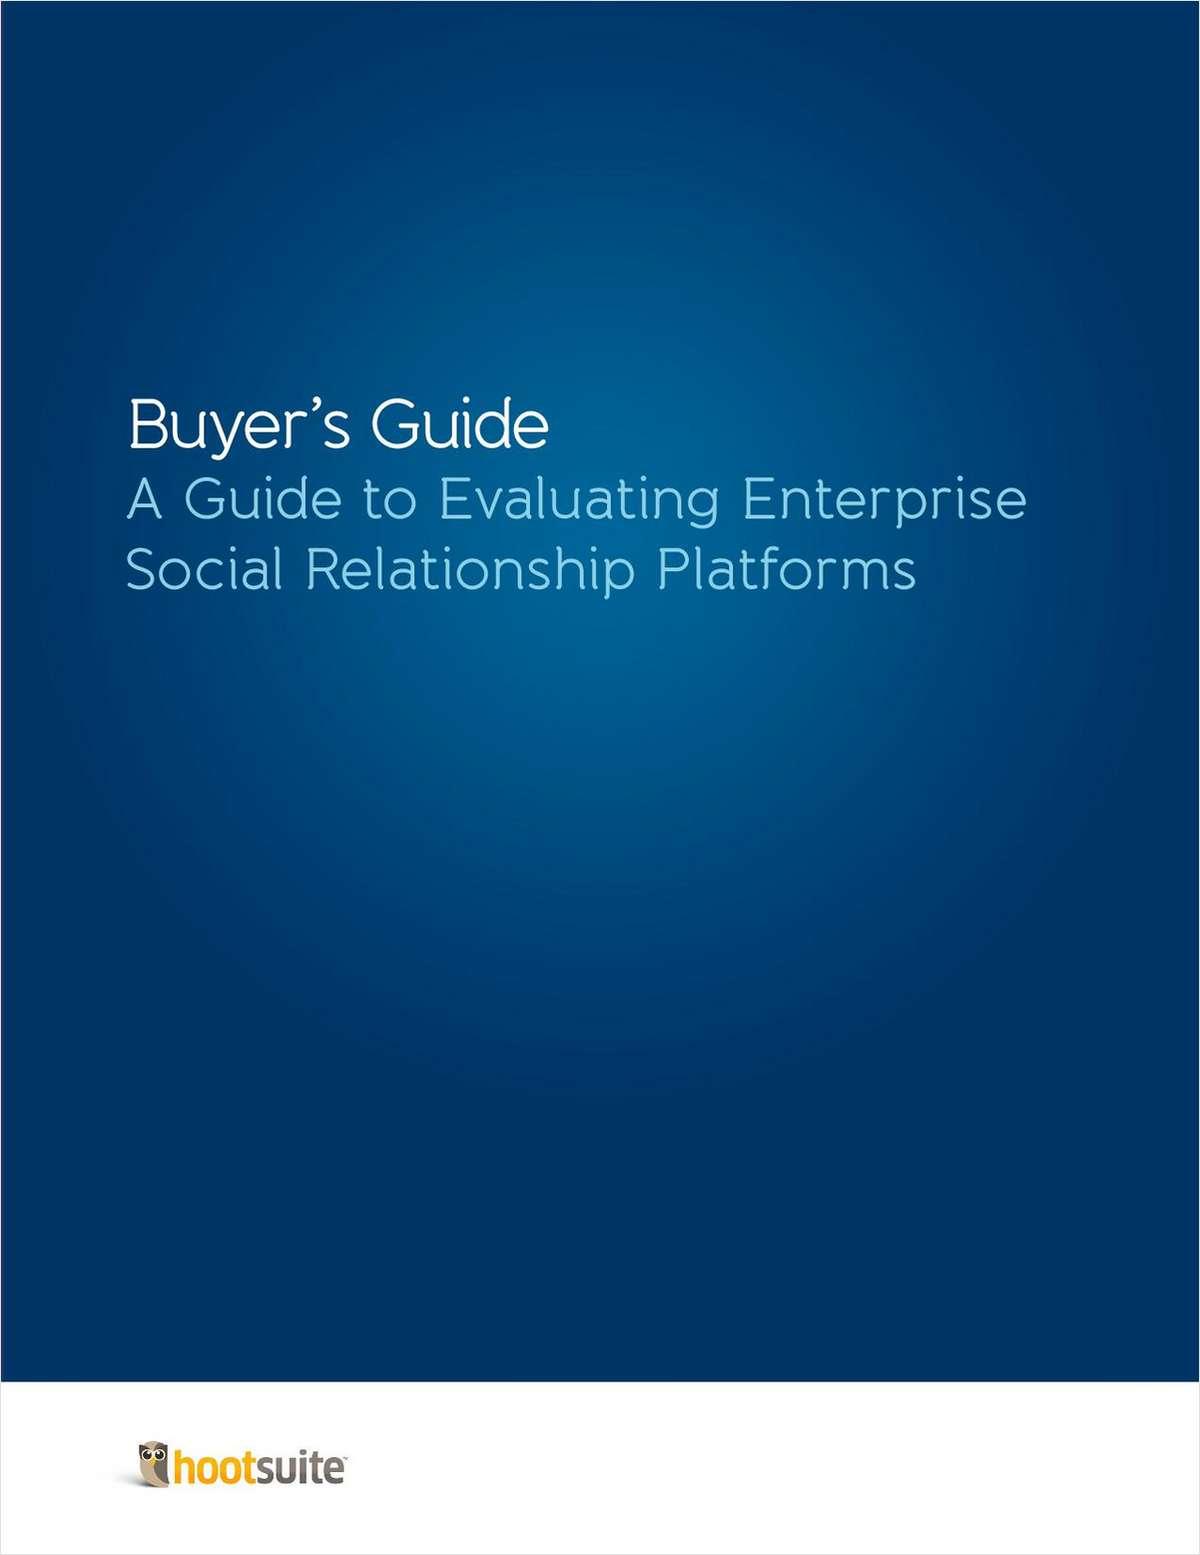 CIO Guide: Evaluating Enterprise Social Relationship Platforms